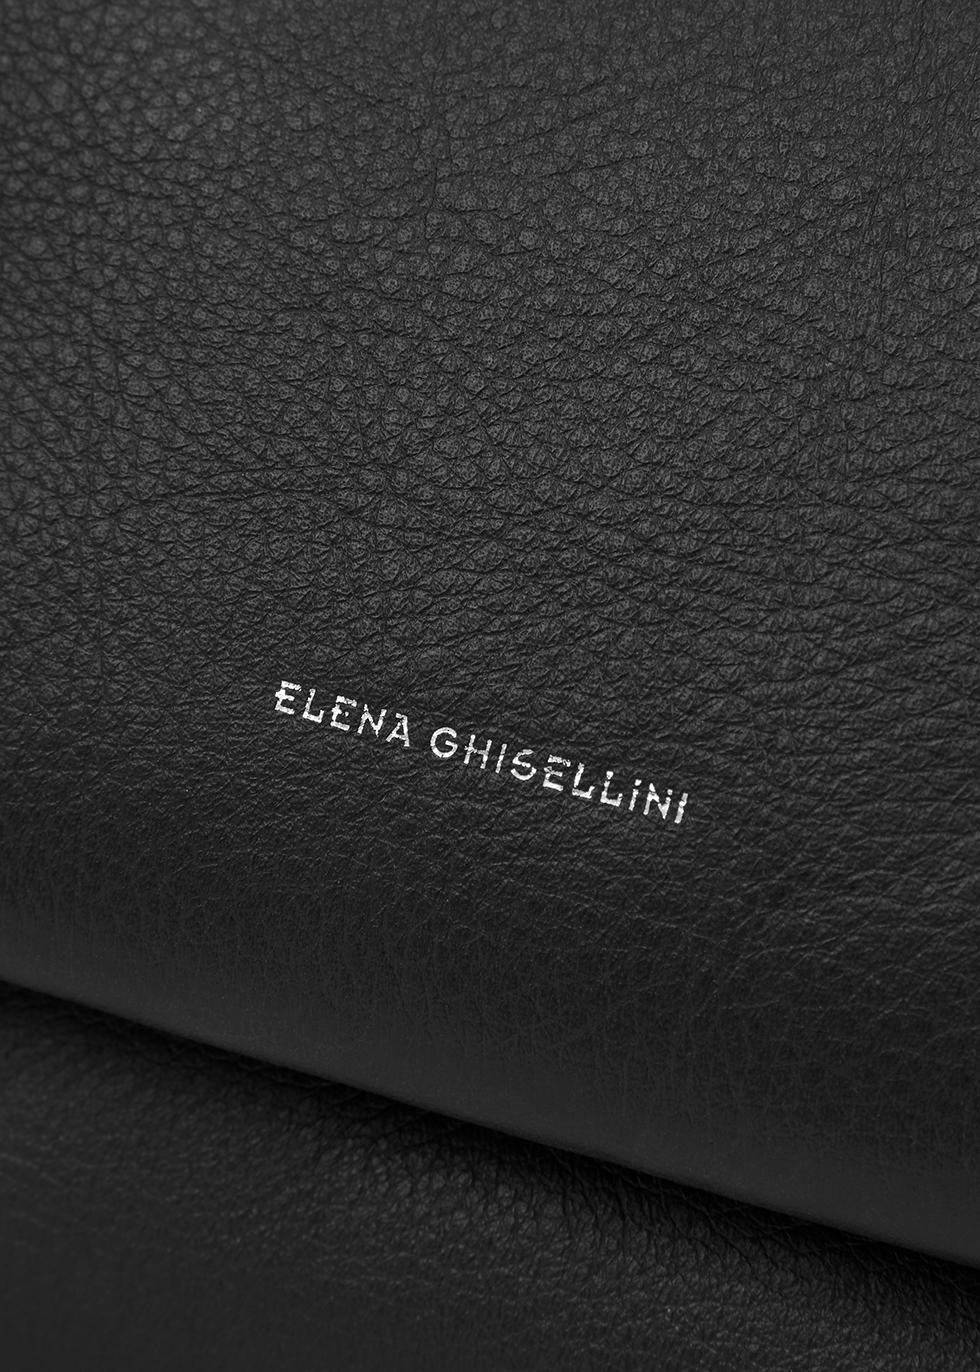 Bunny Touch leather clutch - Elena Ghisellini